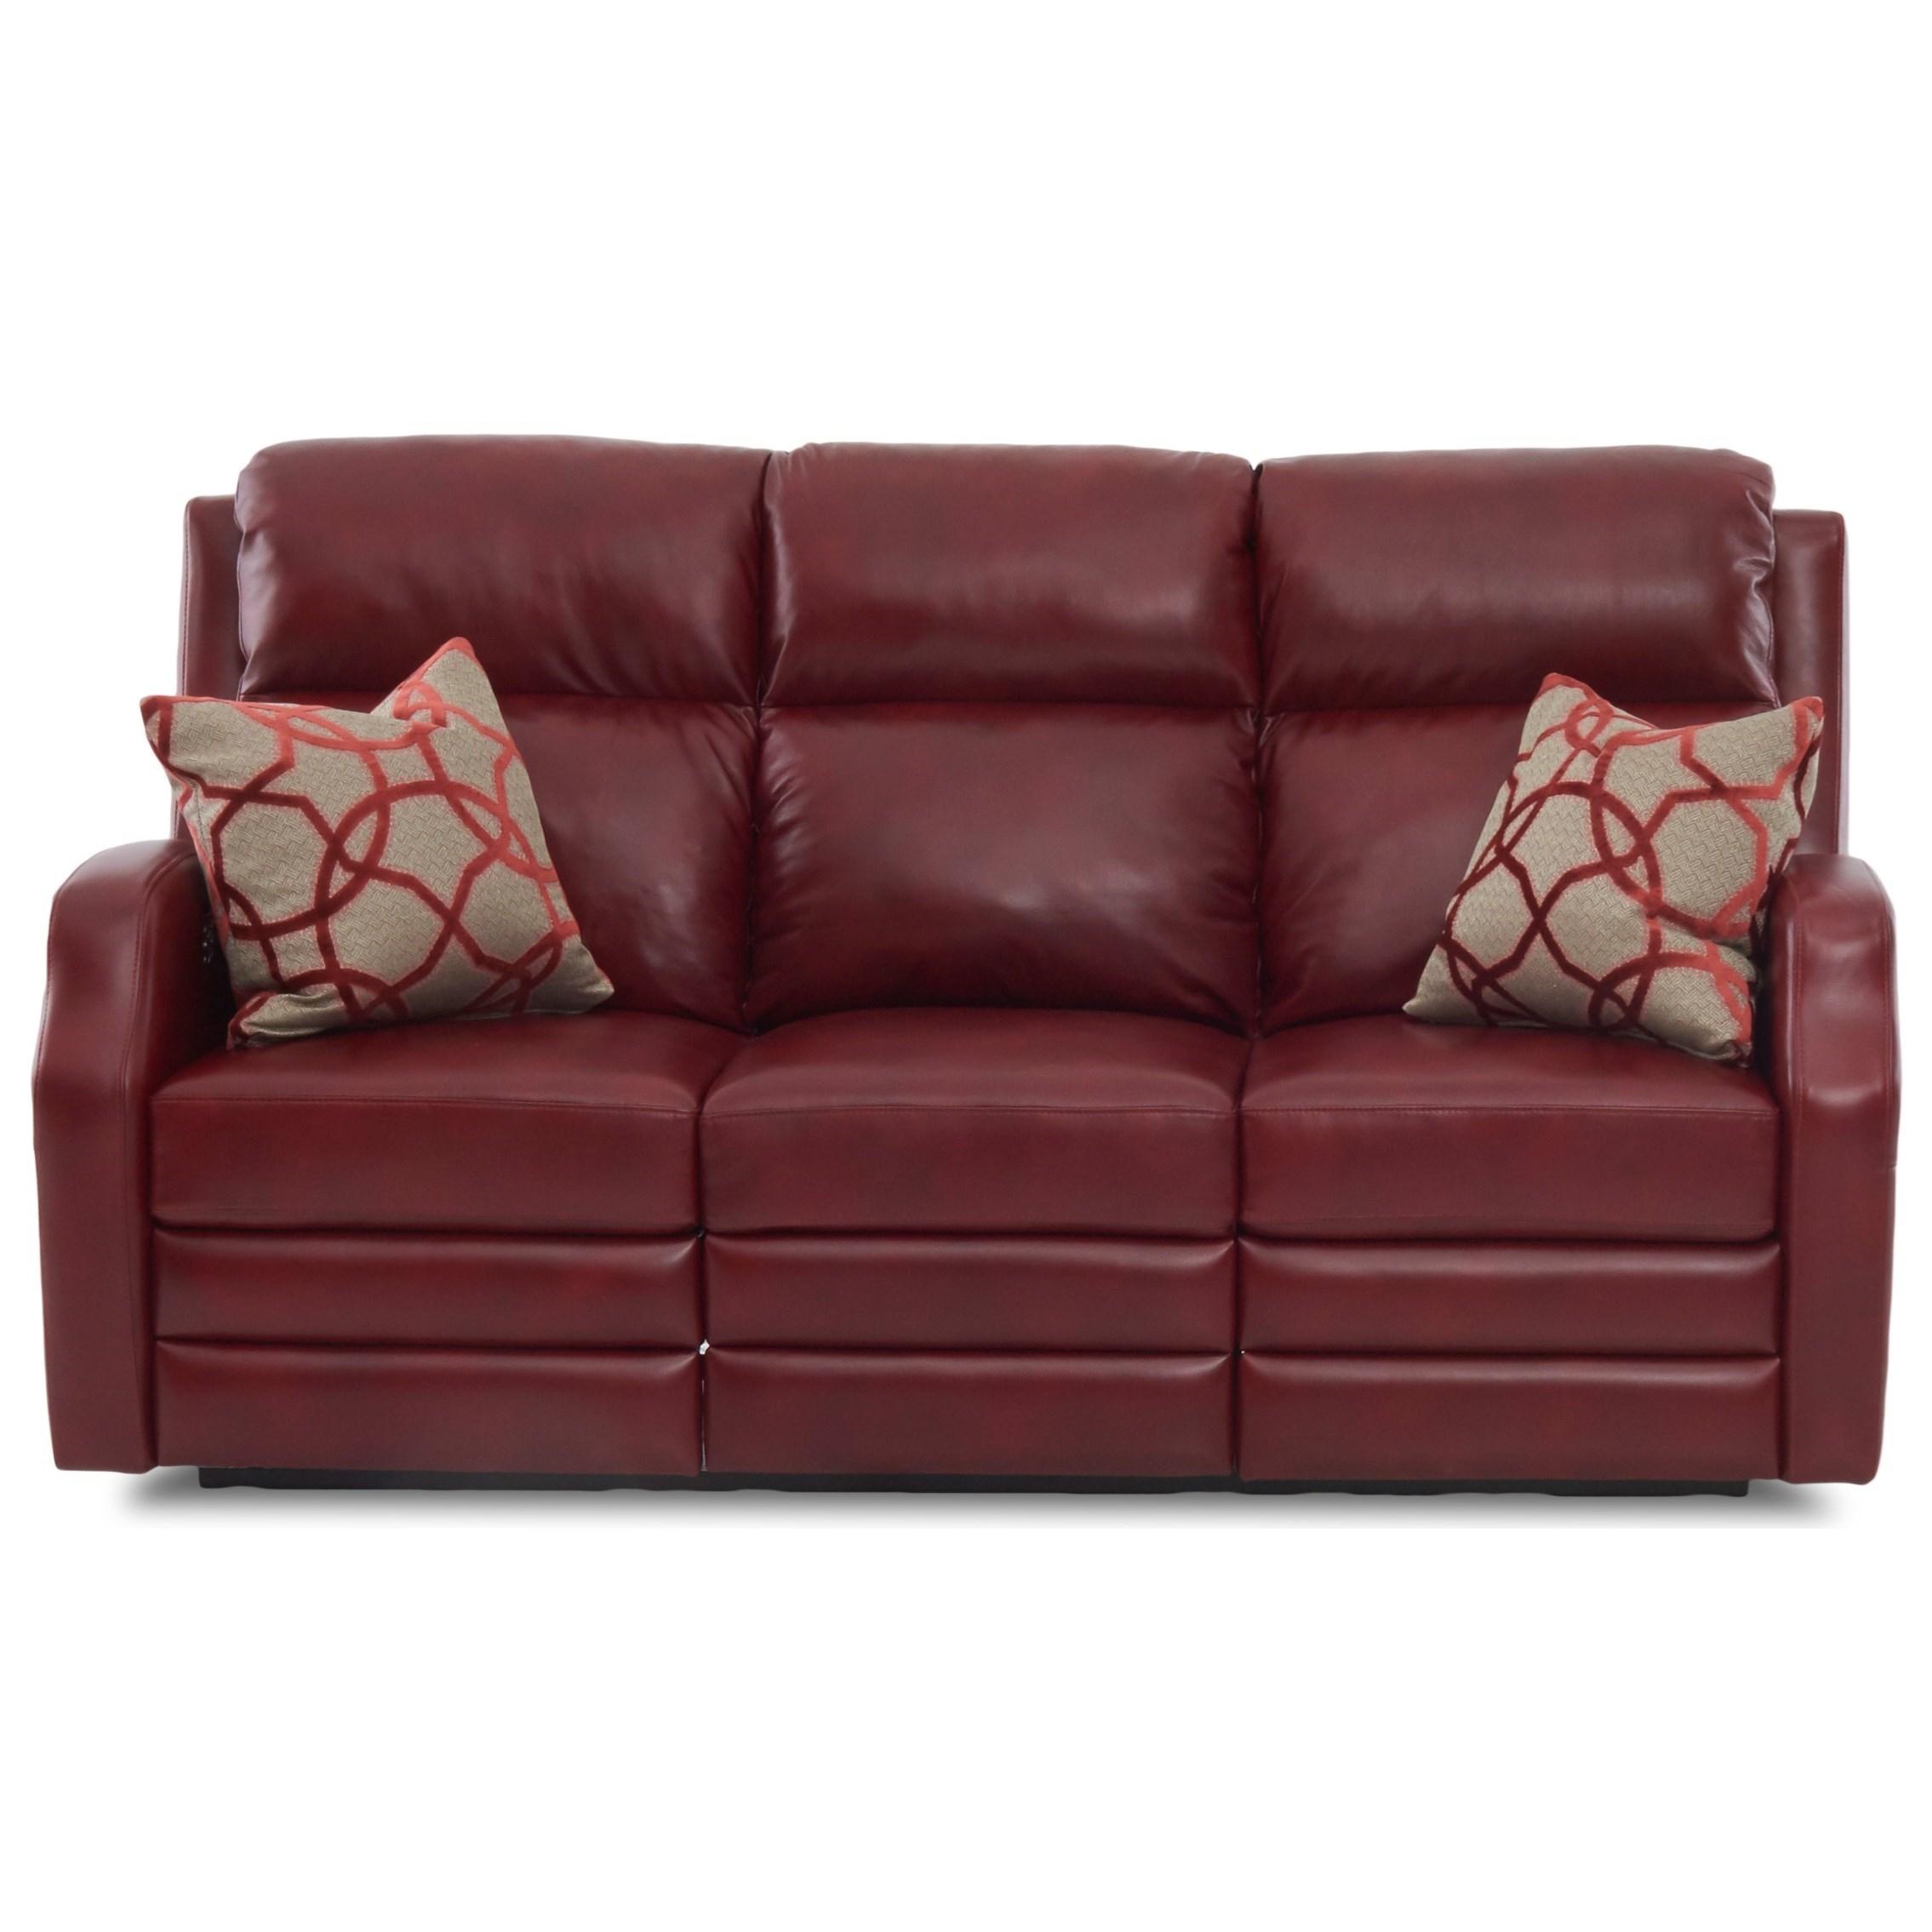 Kamiah Reclining Sofa w/ Pillows by Klaussner at Lapeer Furniture & Mattress Center